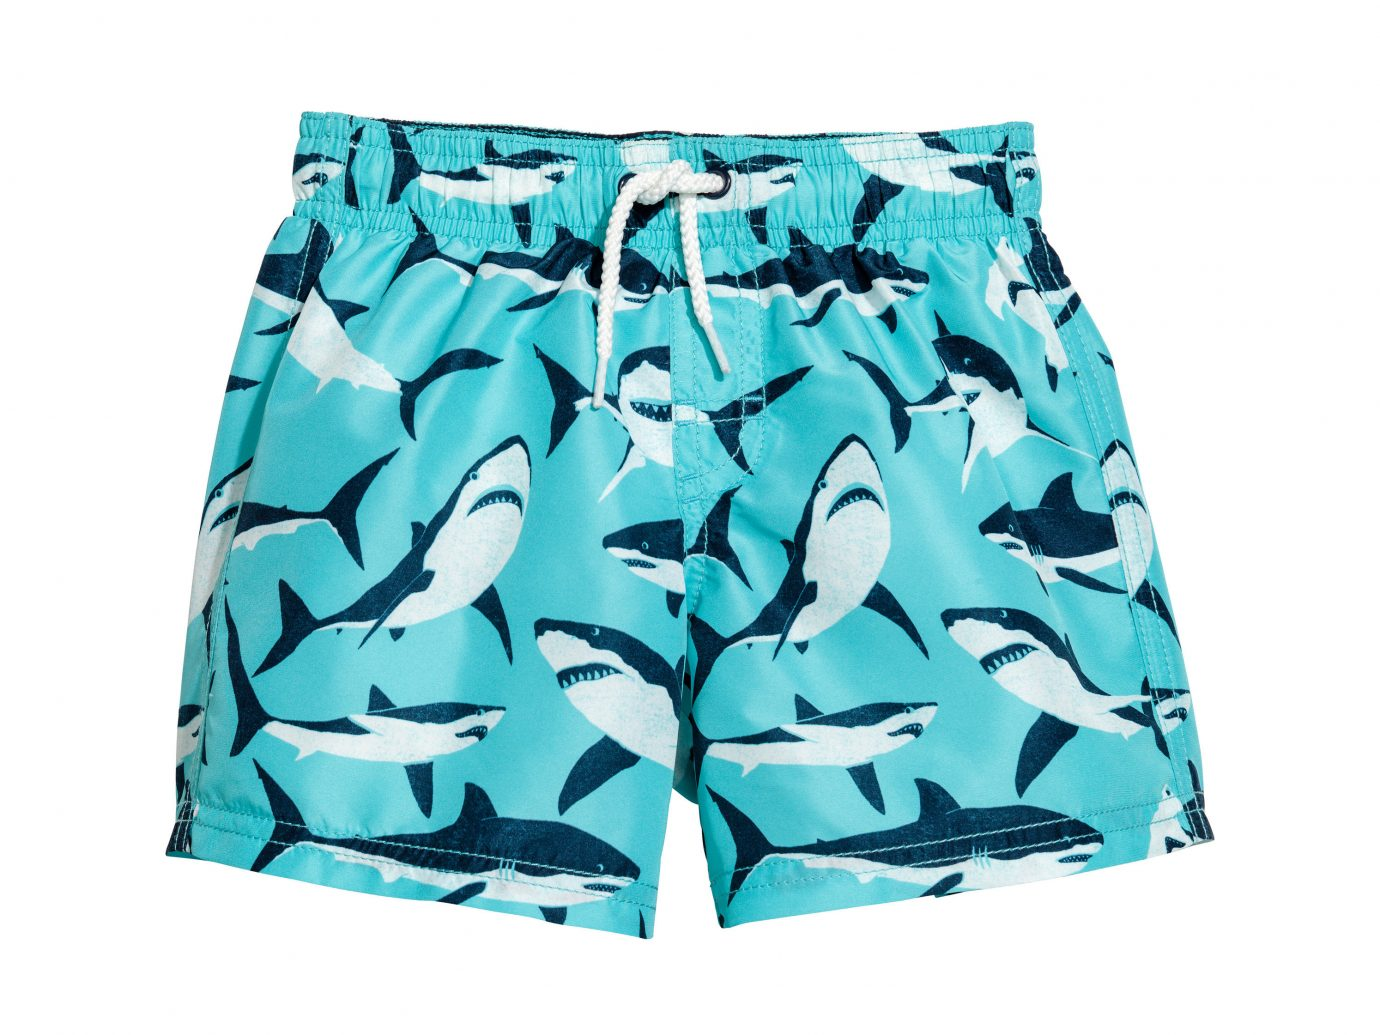 Style + Design clothing aqua shorts active shorts trunks swim brief product swimsuit bottom turquoise underpants